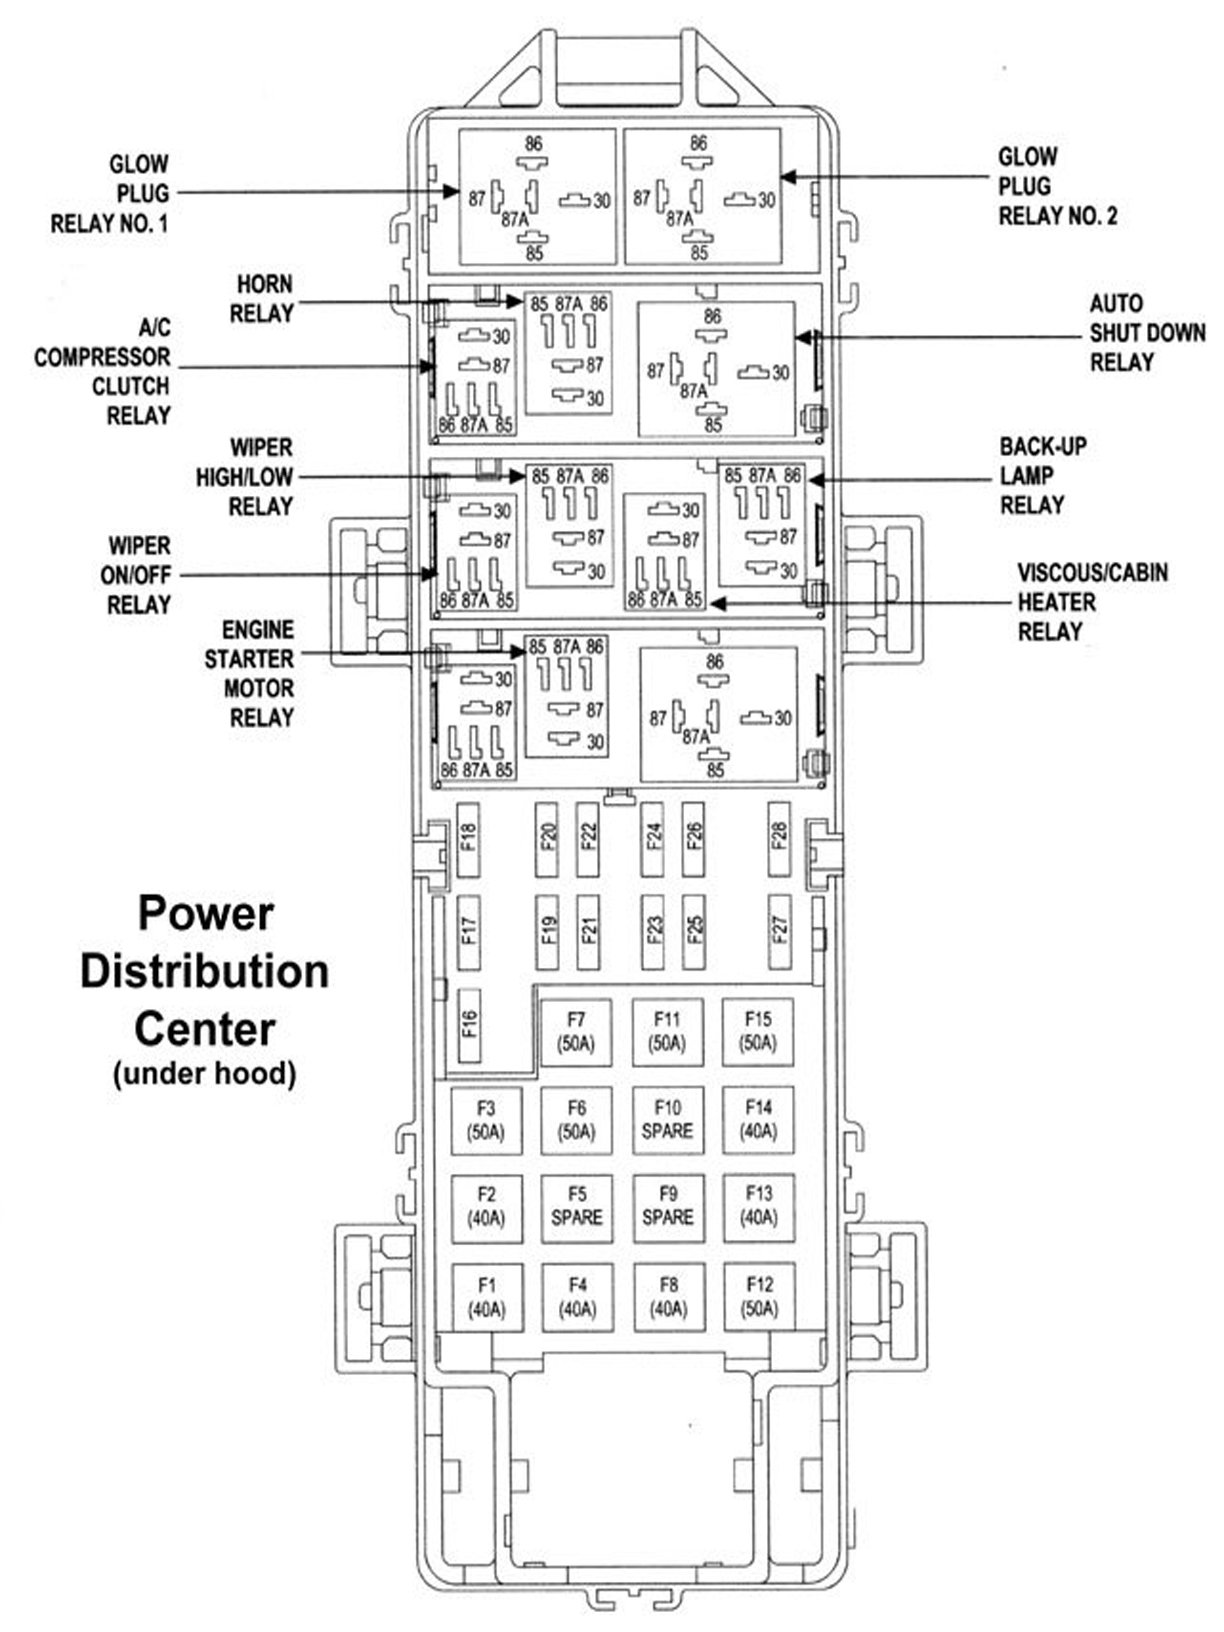 99 Dodge Caravan Fuse Box